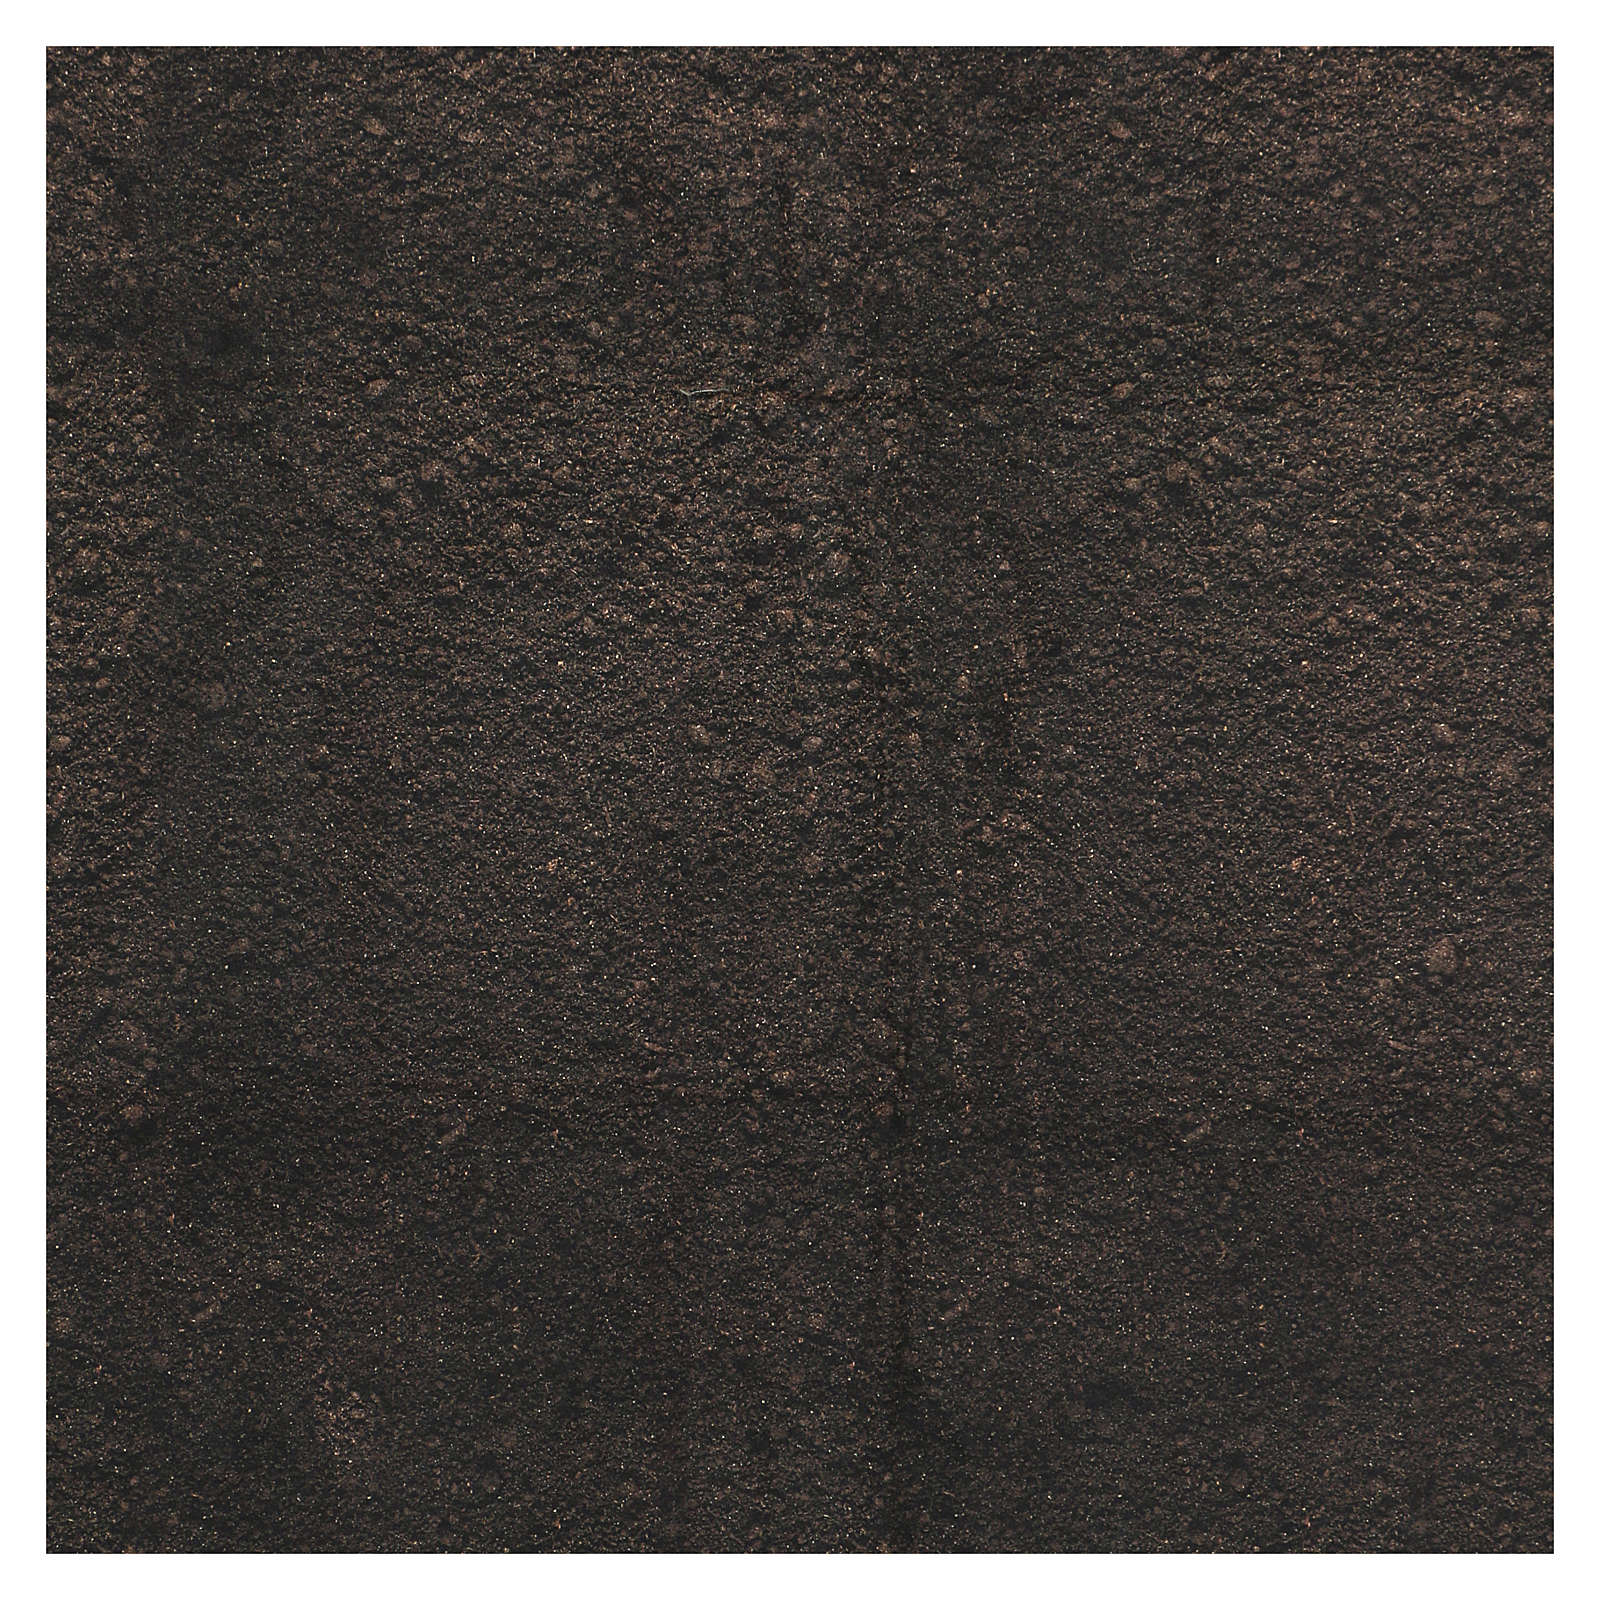 Dirt paper for nativity scene background moldable, 60x60 cm 4